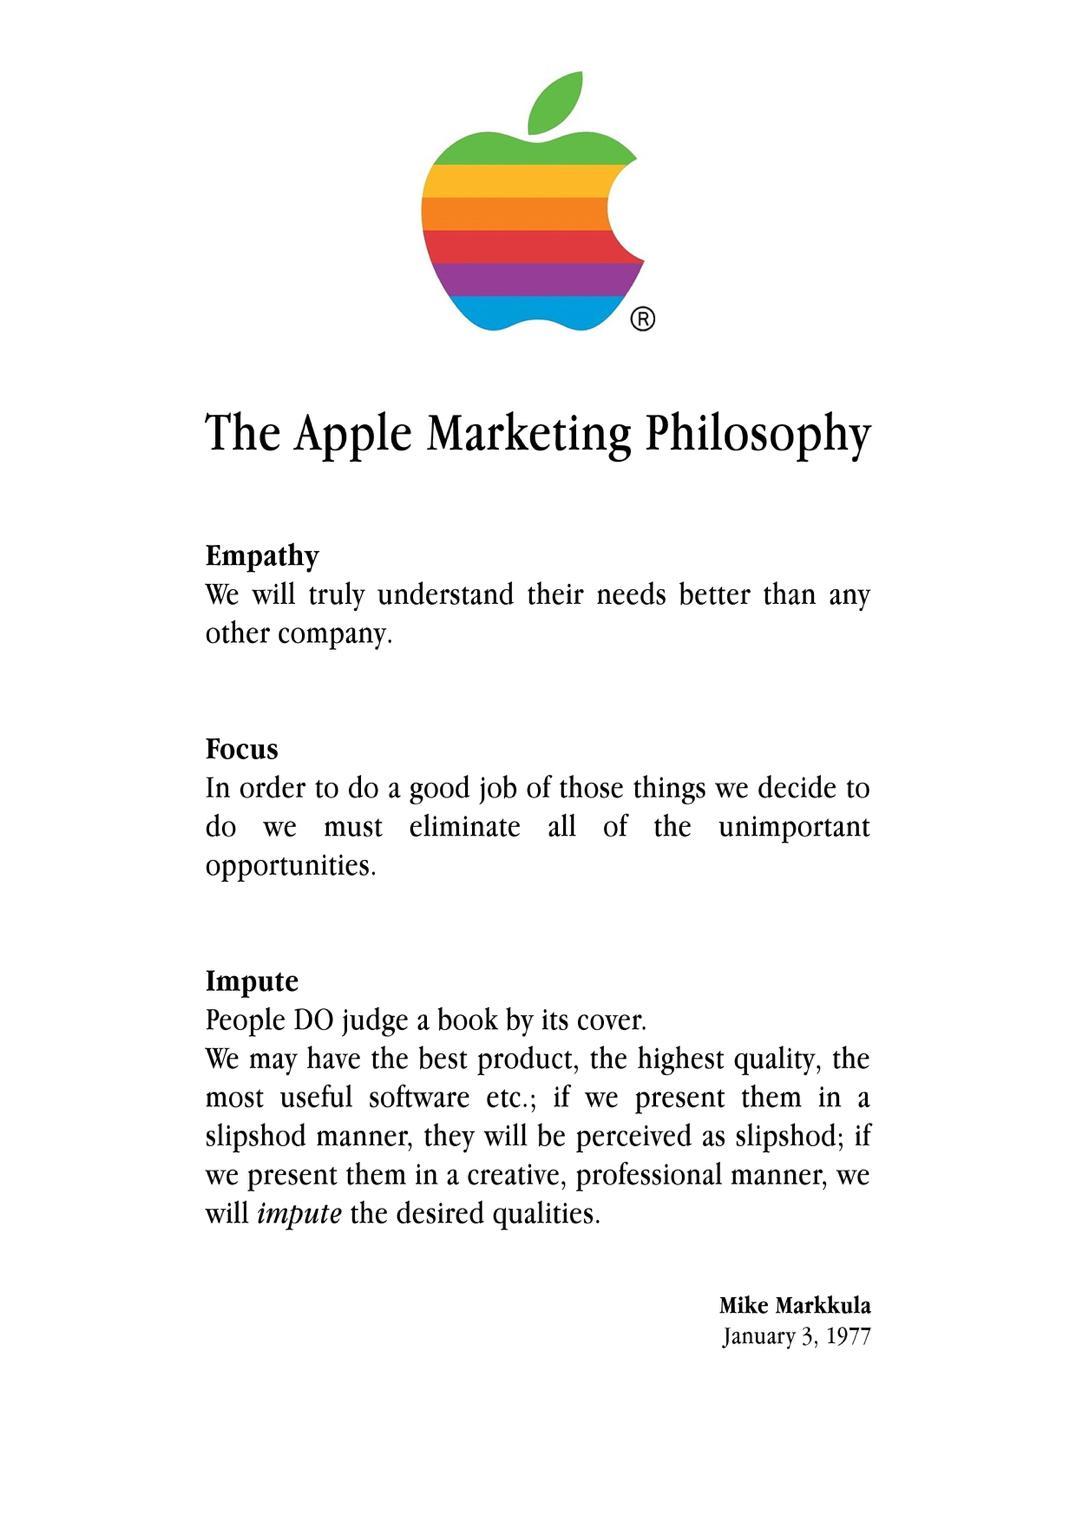 apple marketing philosophy 1977